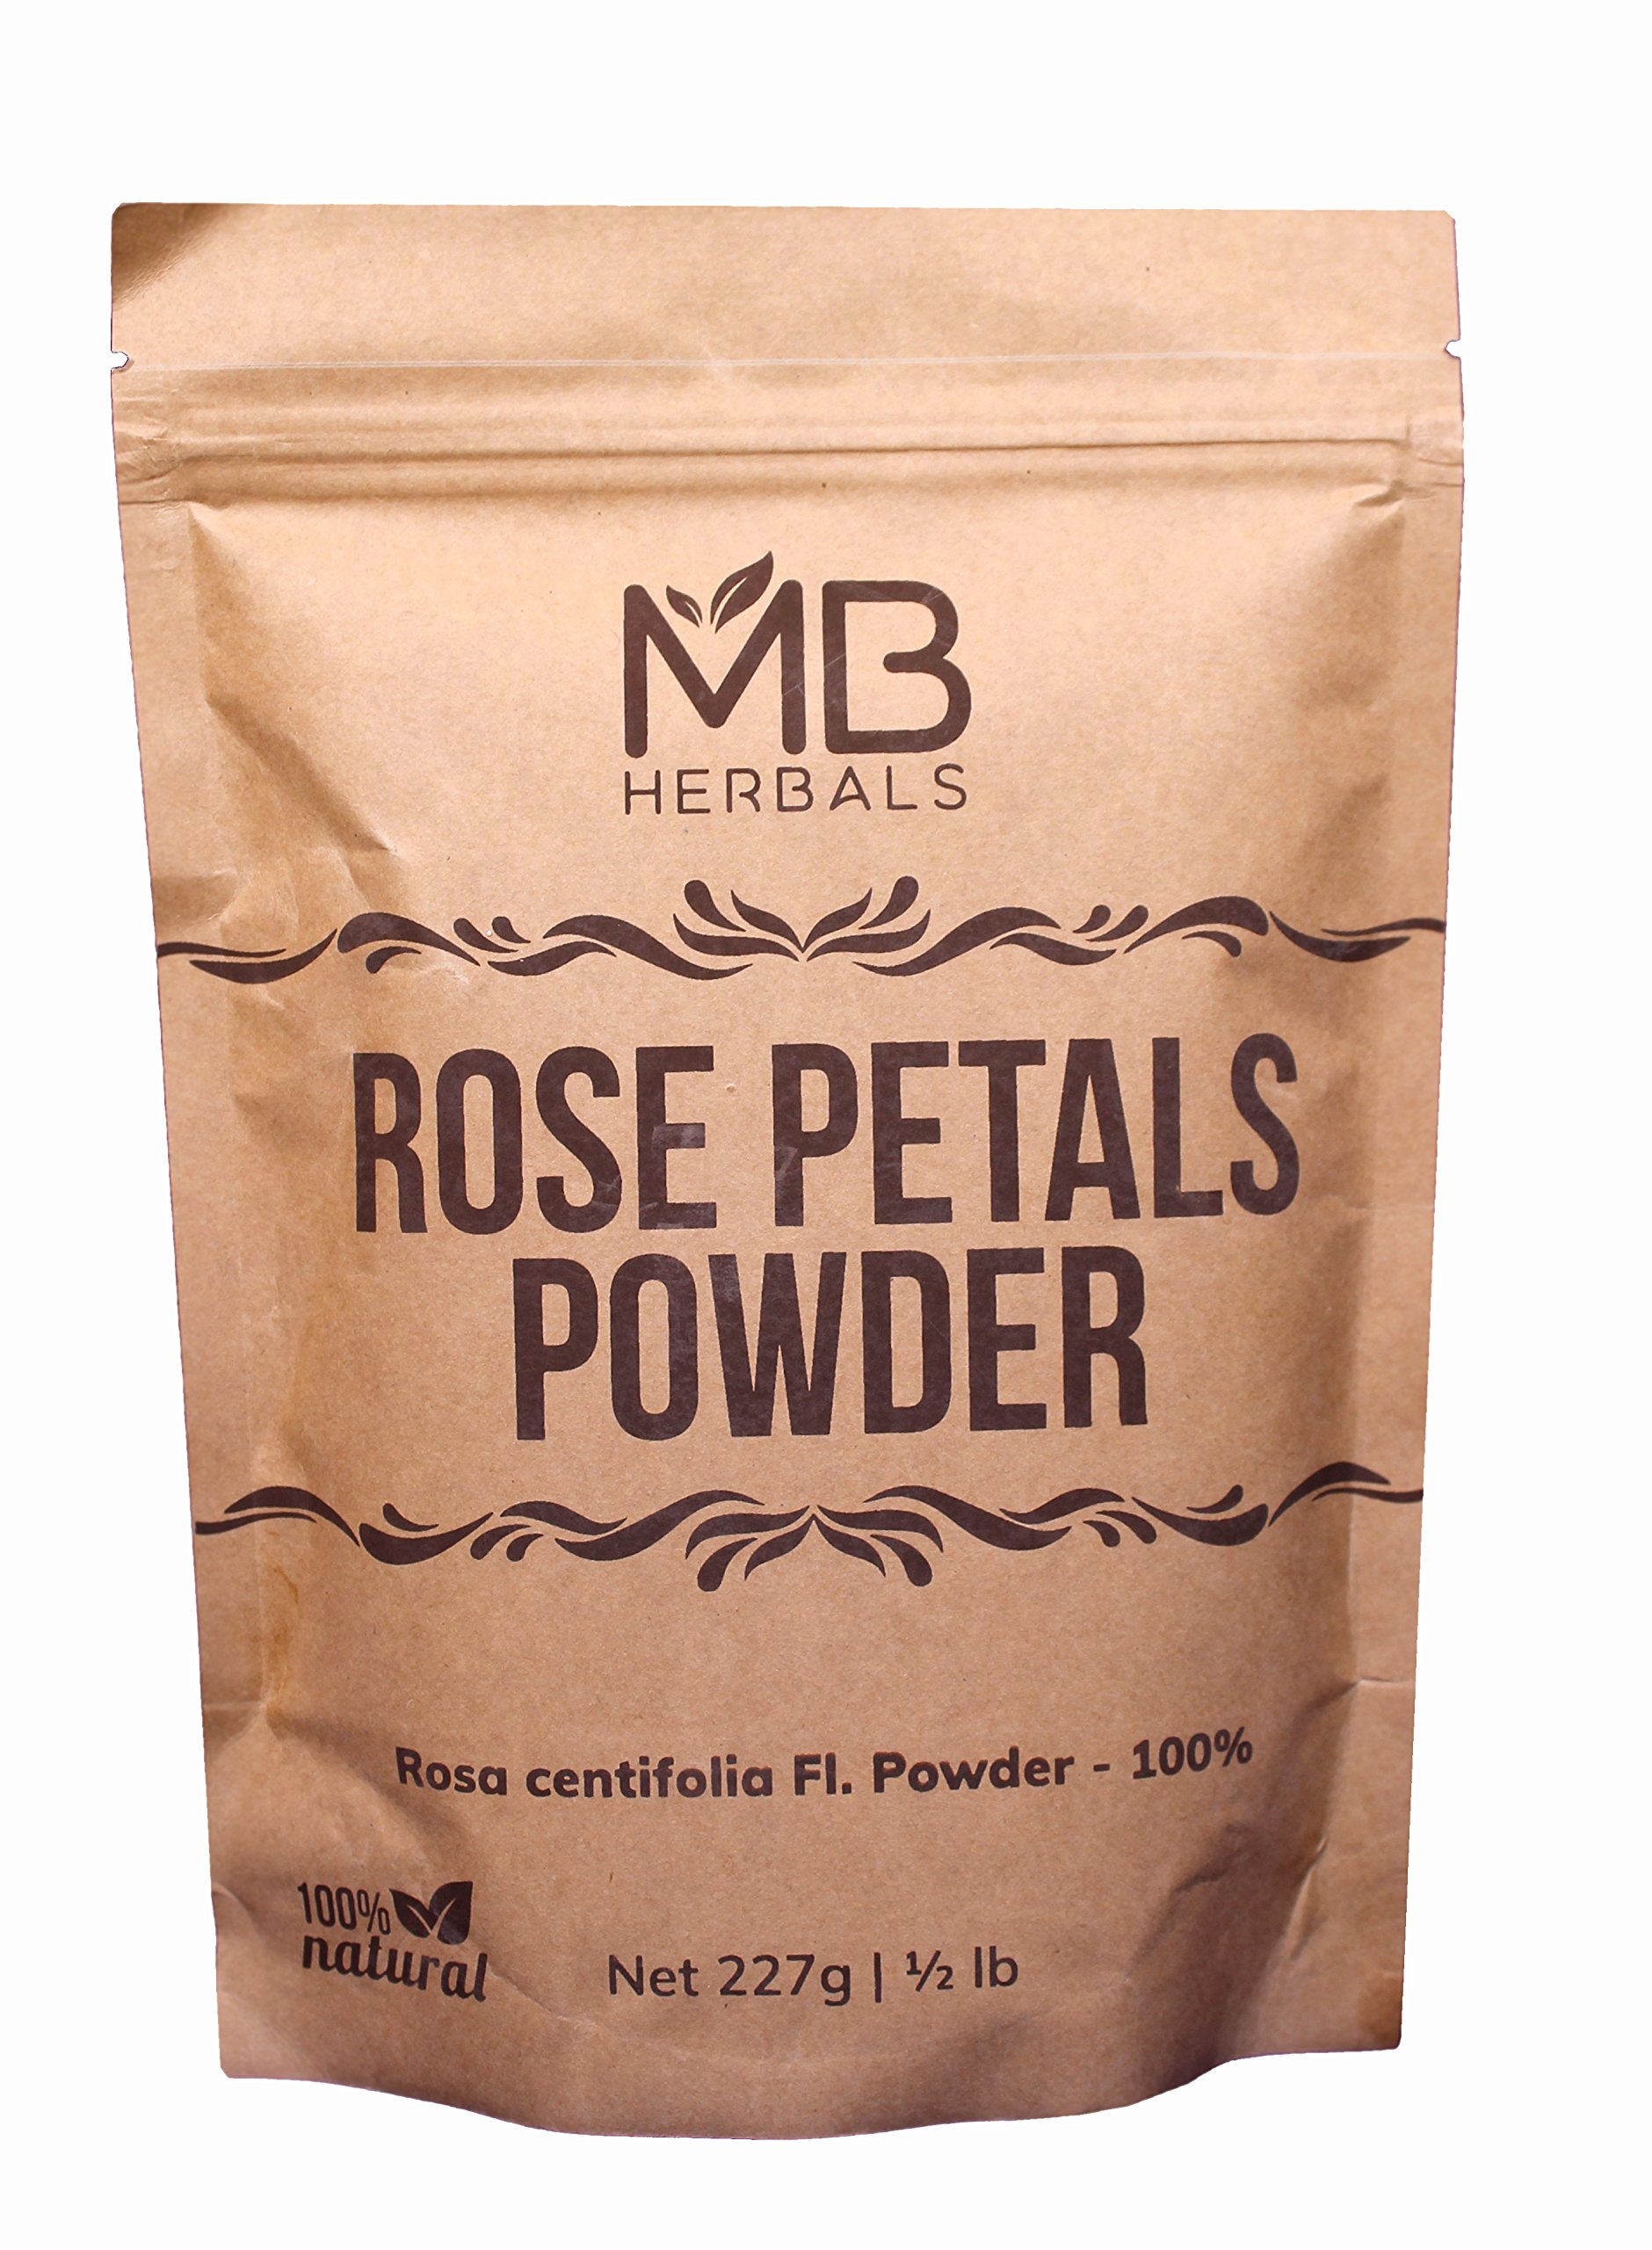 MB Herbals Rose Petals Powder 227g   Half Pound   8 oz   Rosa centifolia   Kashmir Origin   for Natural Face Packs & Facial Mask Formulations   100% Pure   Chemical-Free   Preservative-Free